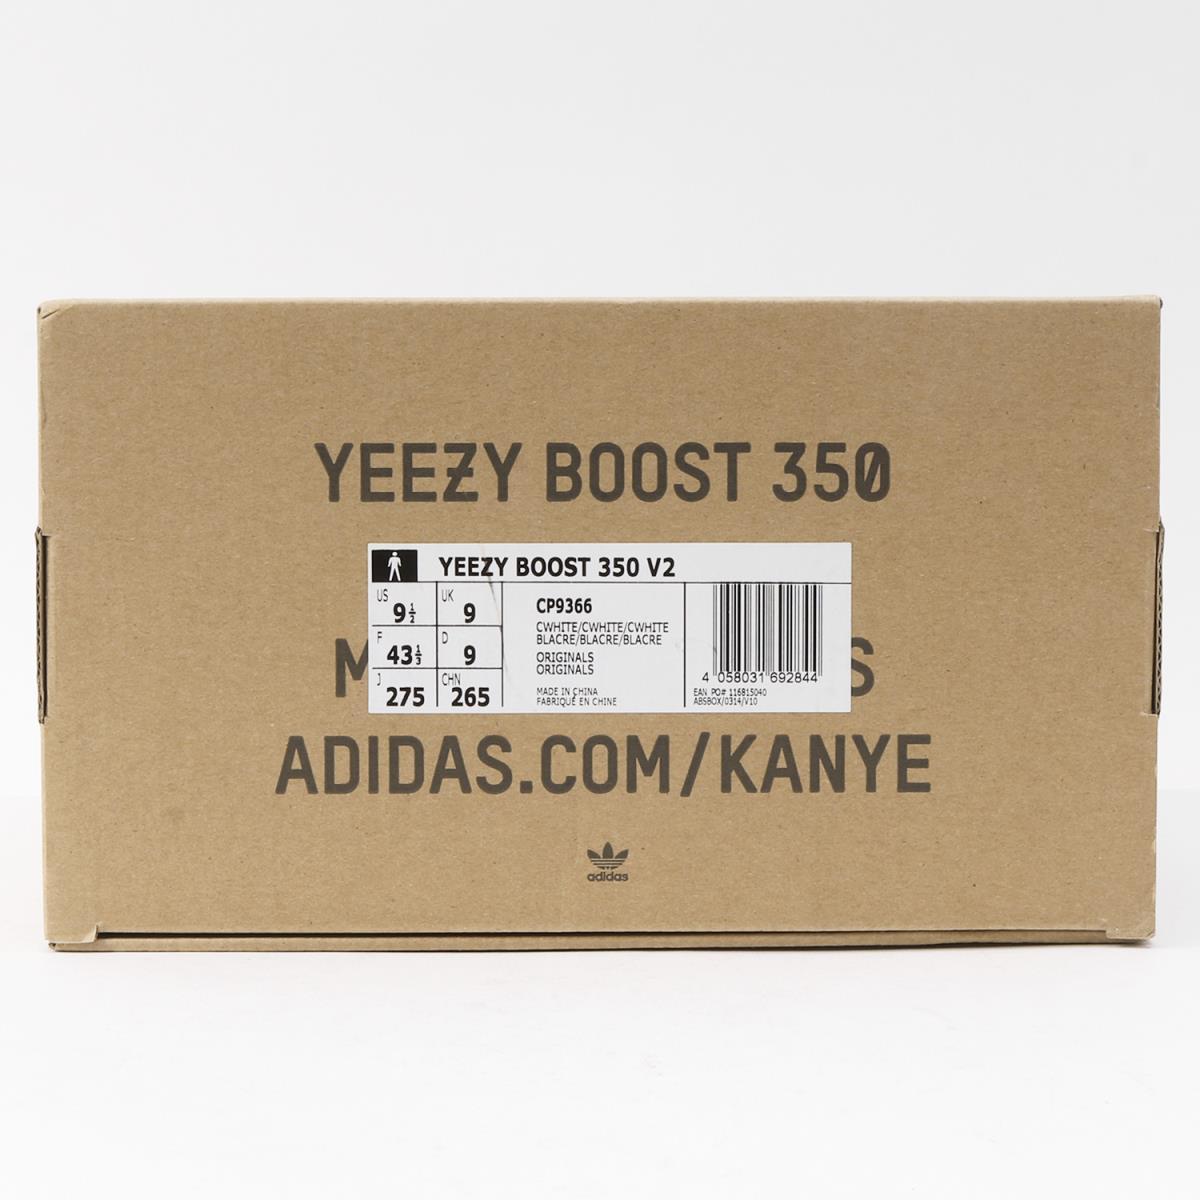 b483bee75738b adidas (Adidas) YEEZY BOOST 350 V2 CREAM WHITE (CP9366) white US9.5(27.5cm)